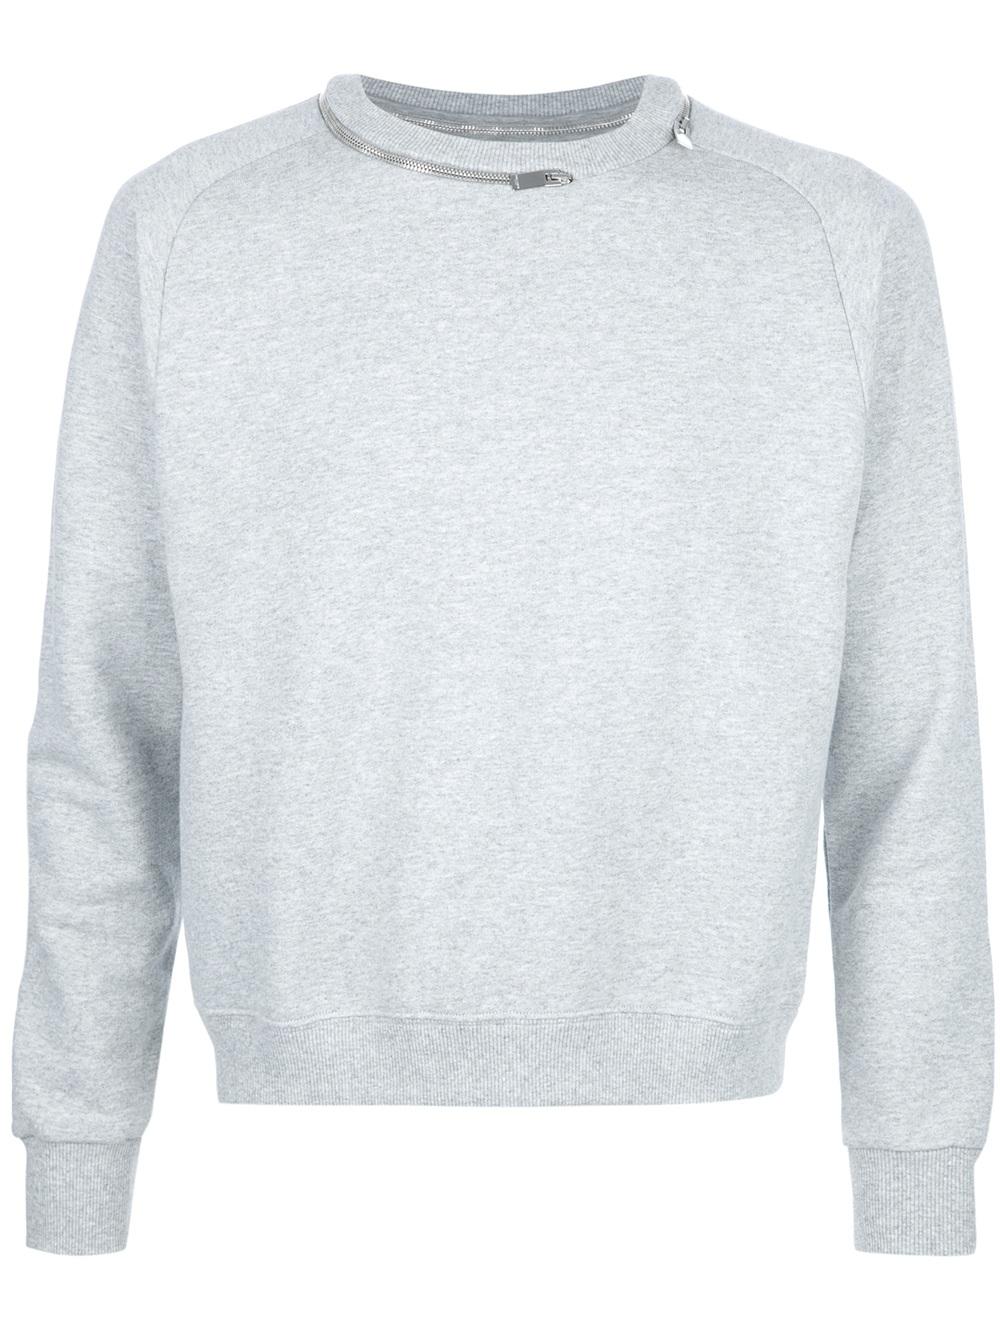 00O00 Menswear Blog: Miguel in BLK DNM and Saint Laurent zipped sweatshirt - 102.7 KIIS FM's Wango Tango May 2013